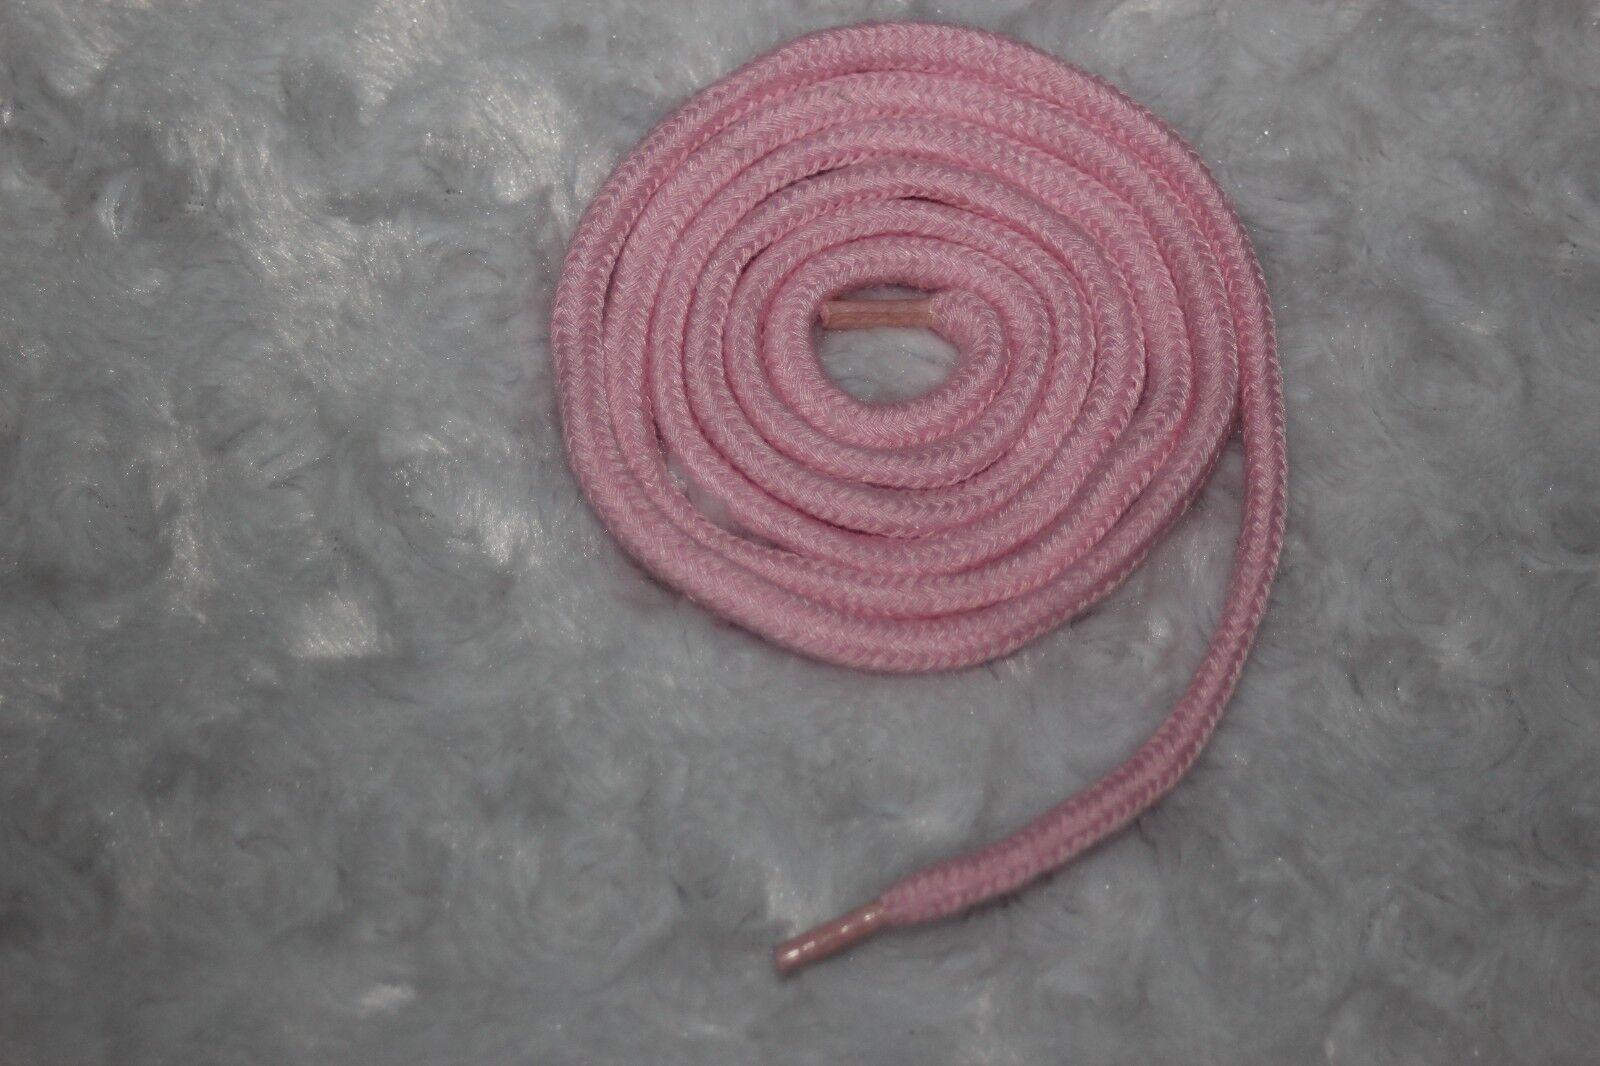 Replacement Drawstring White Red Black Gray plastic Tip Hoodies Sweatpants Bags Baby Pink Plastic Tip 43-44